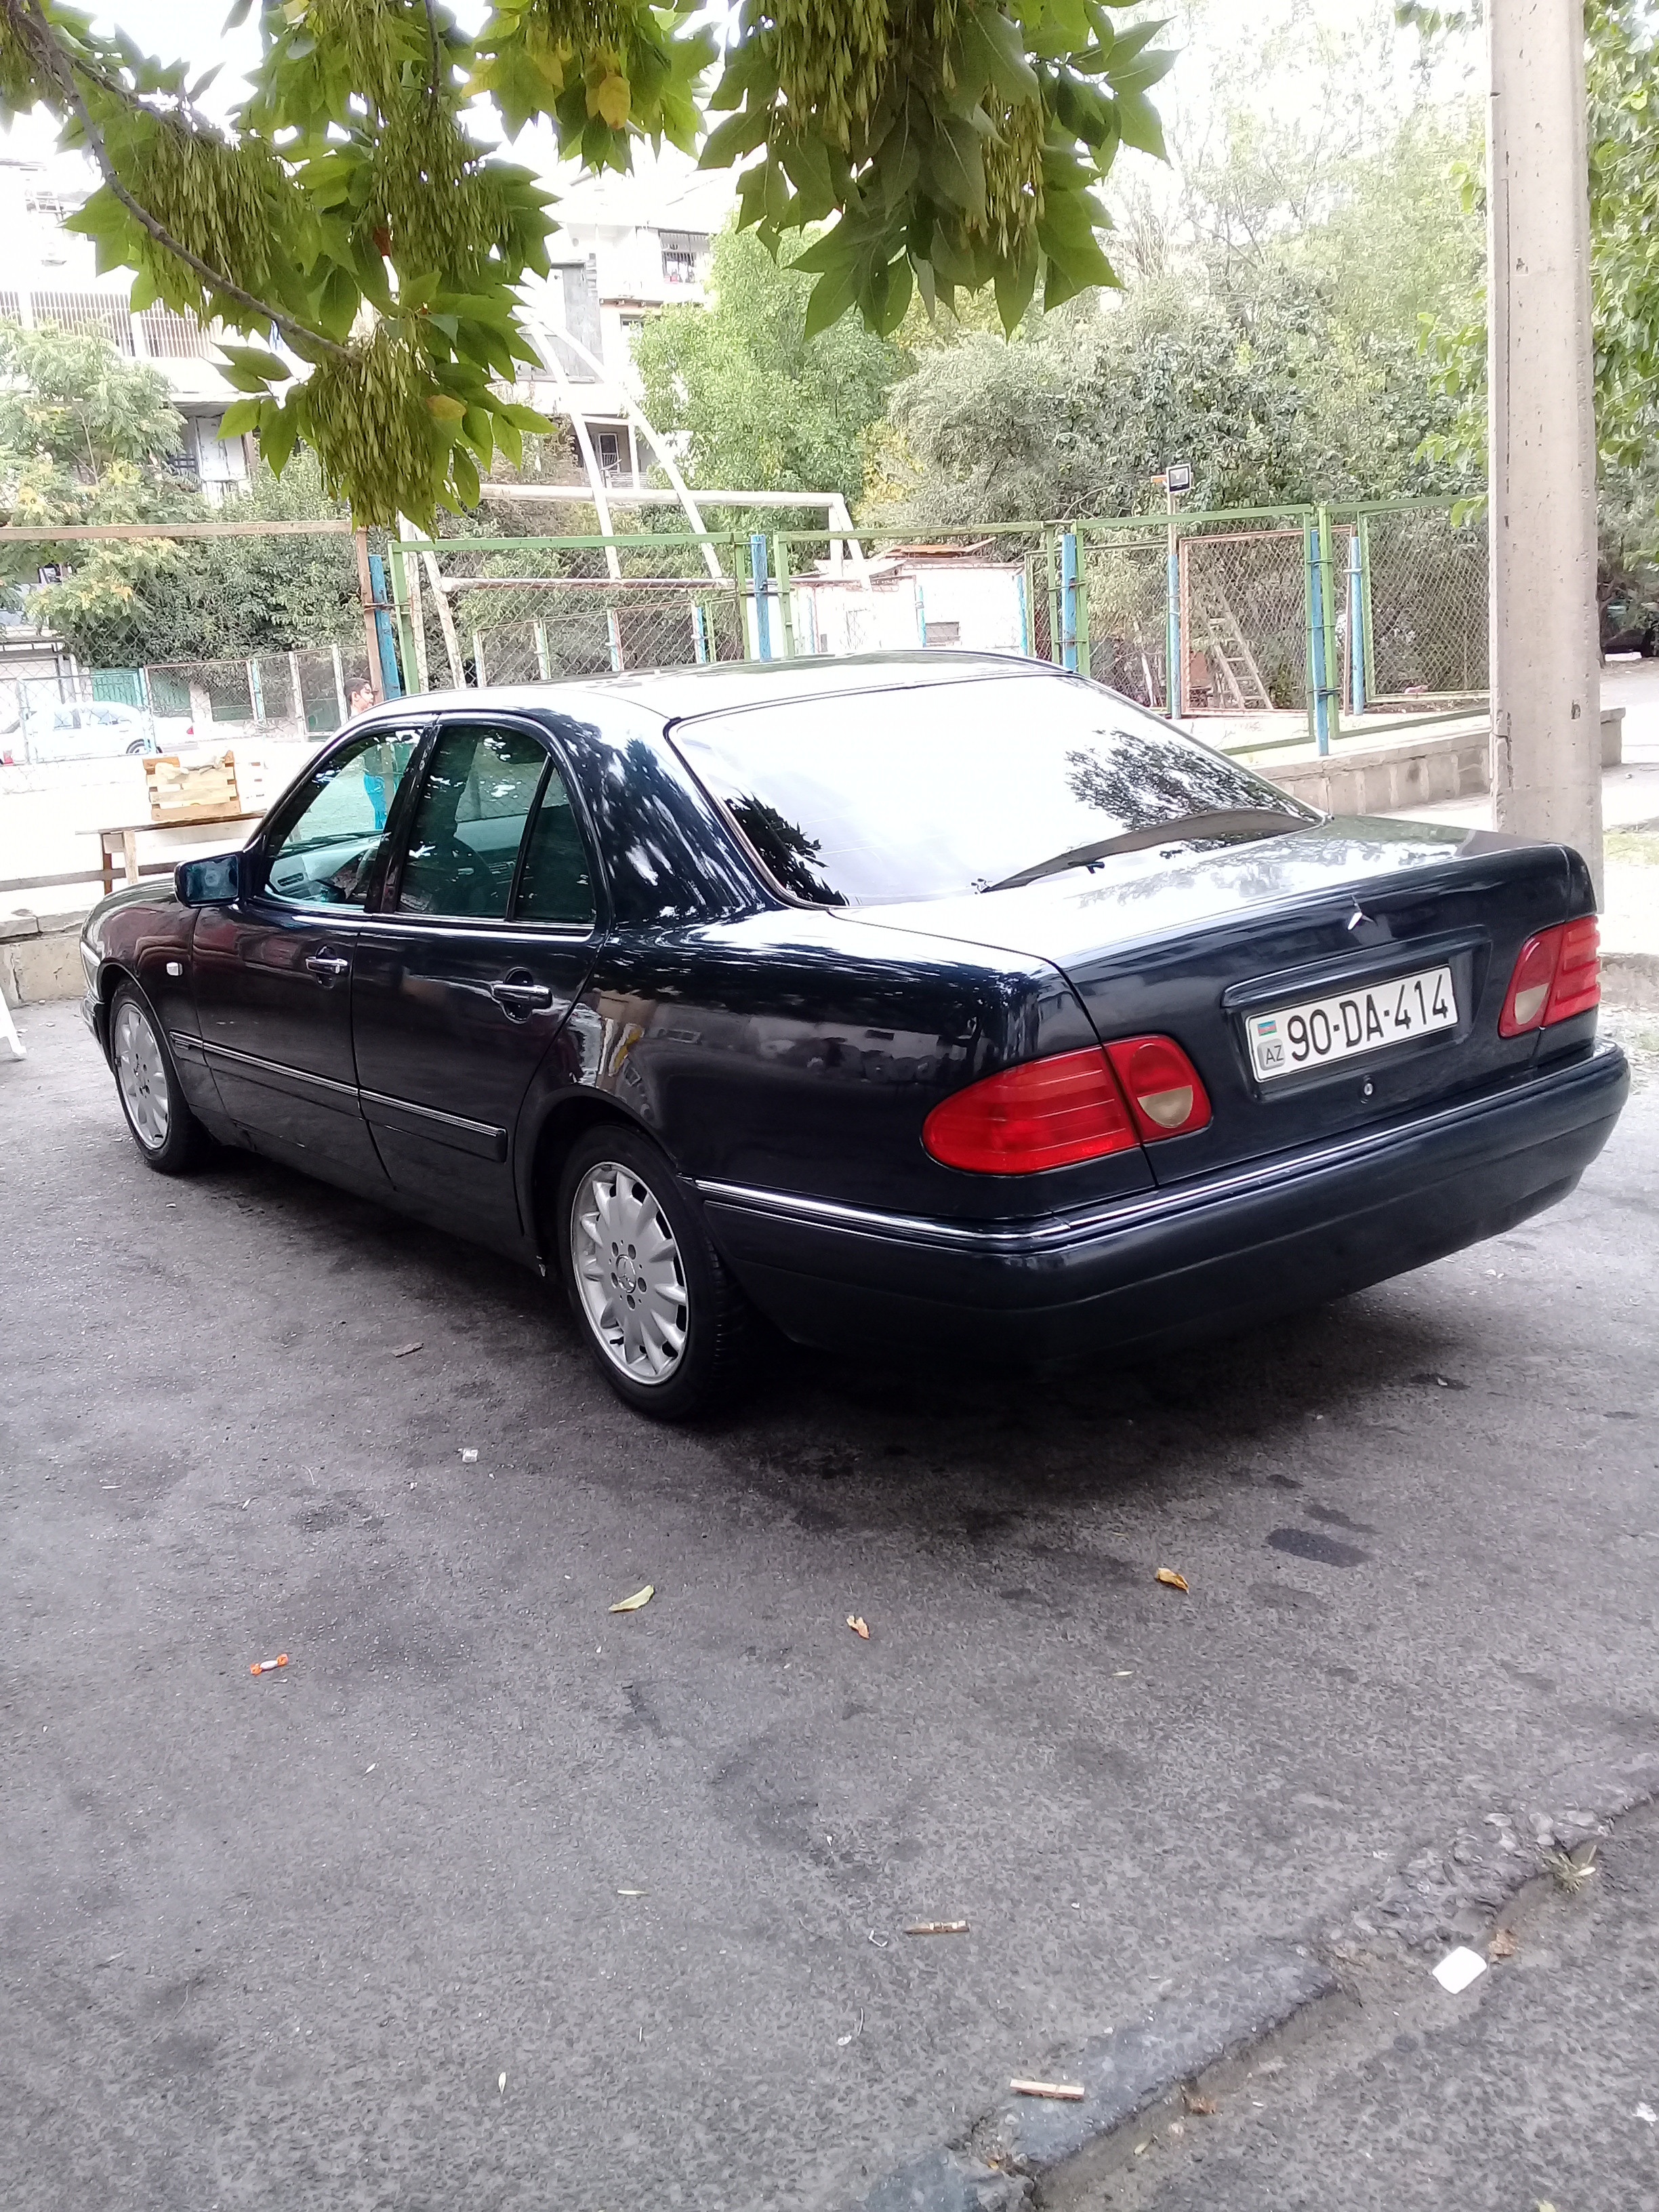 Mercedes-Benz E 230 2.3(lt) 1996 Подержанный  $5300